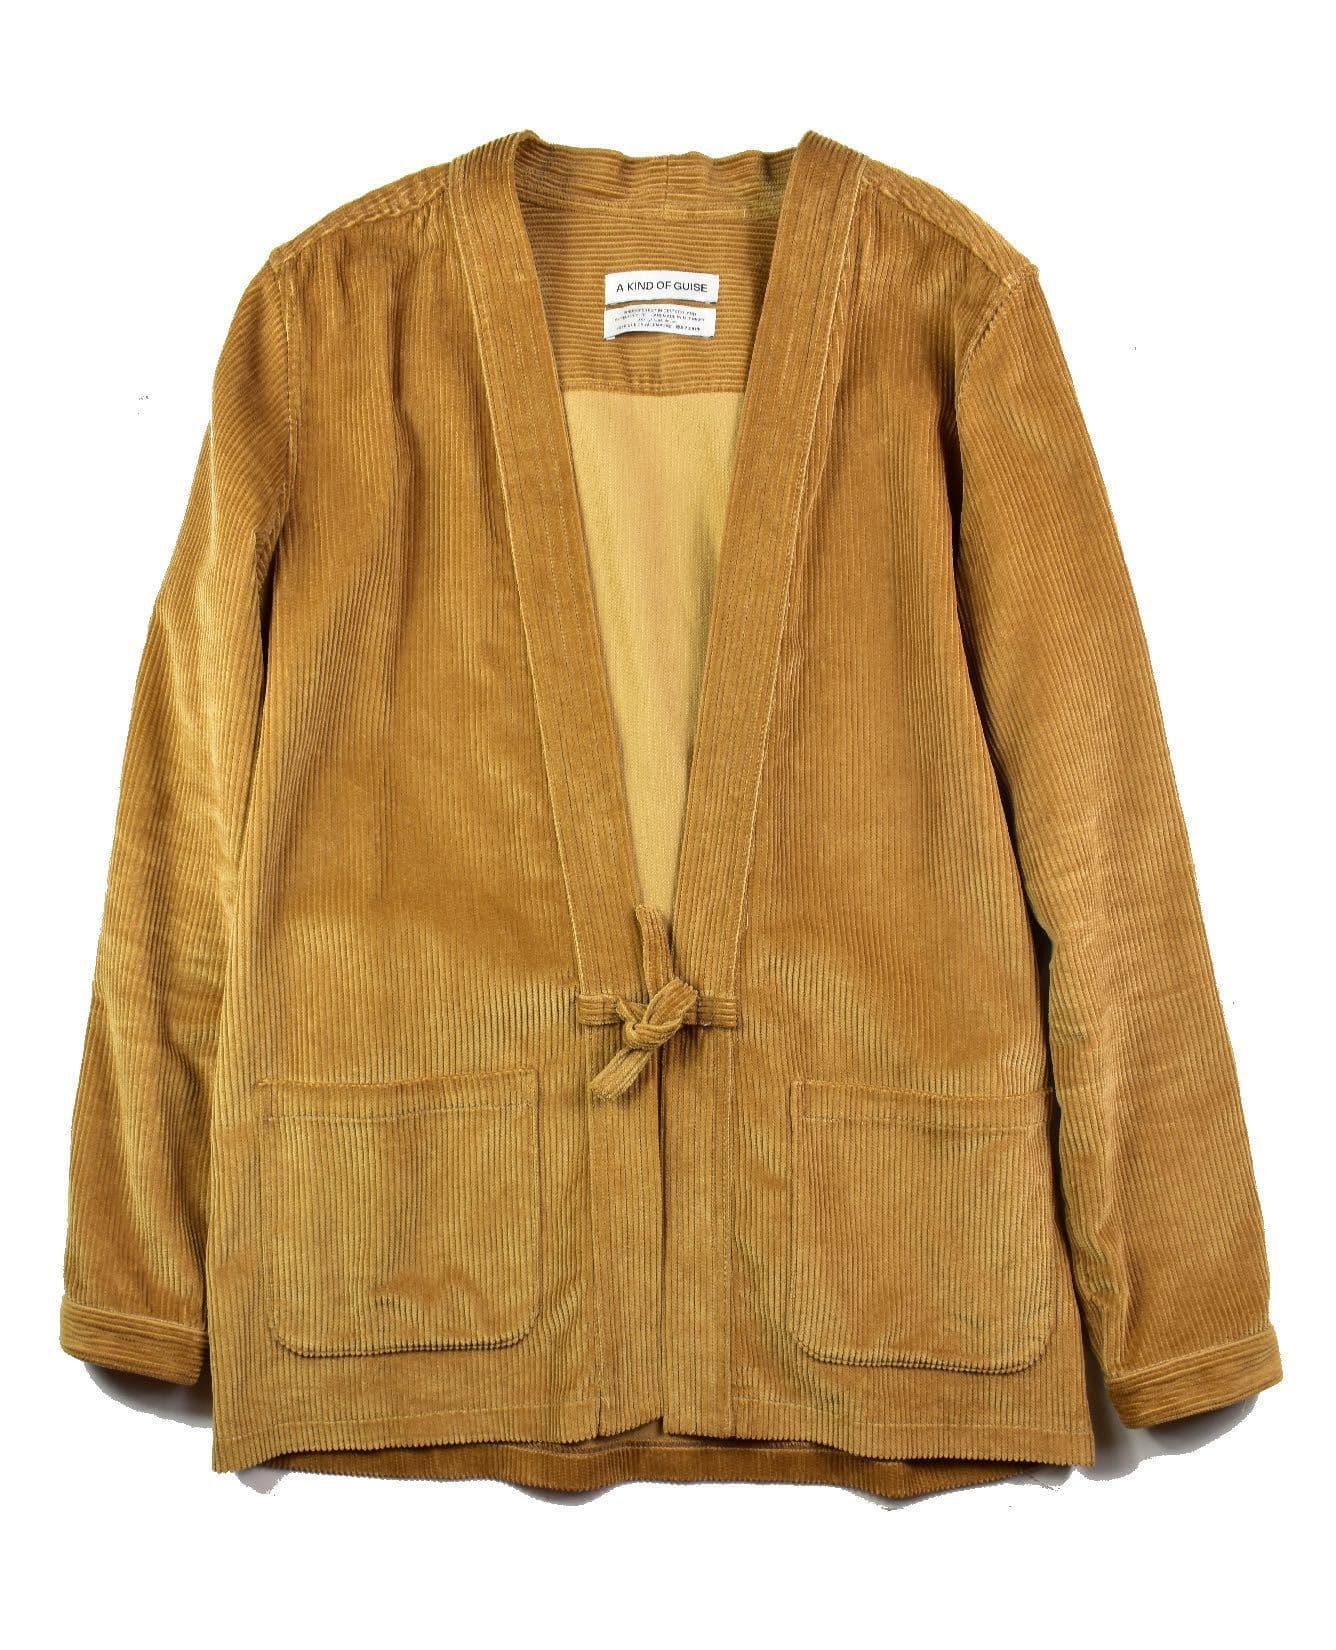 A-kind-of-guise-kohaku-cardigan-corduroy-noragi-jac - 1